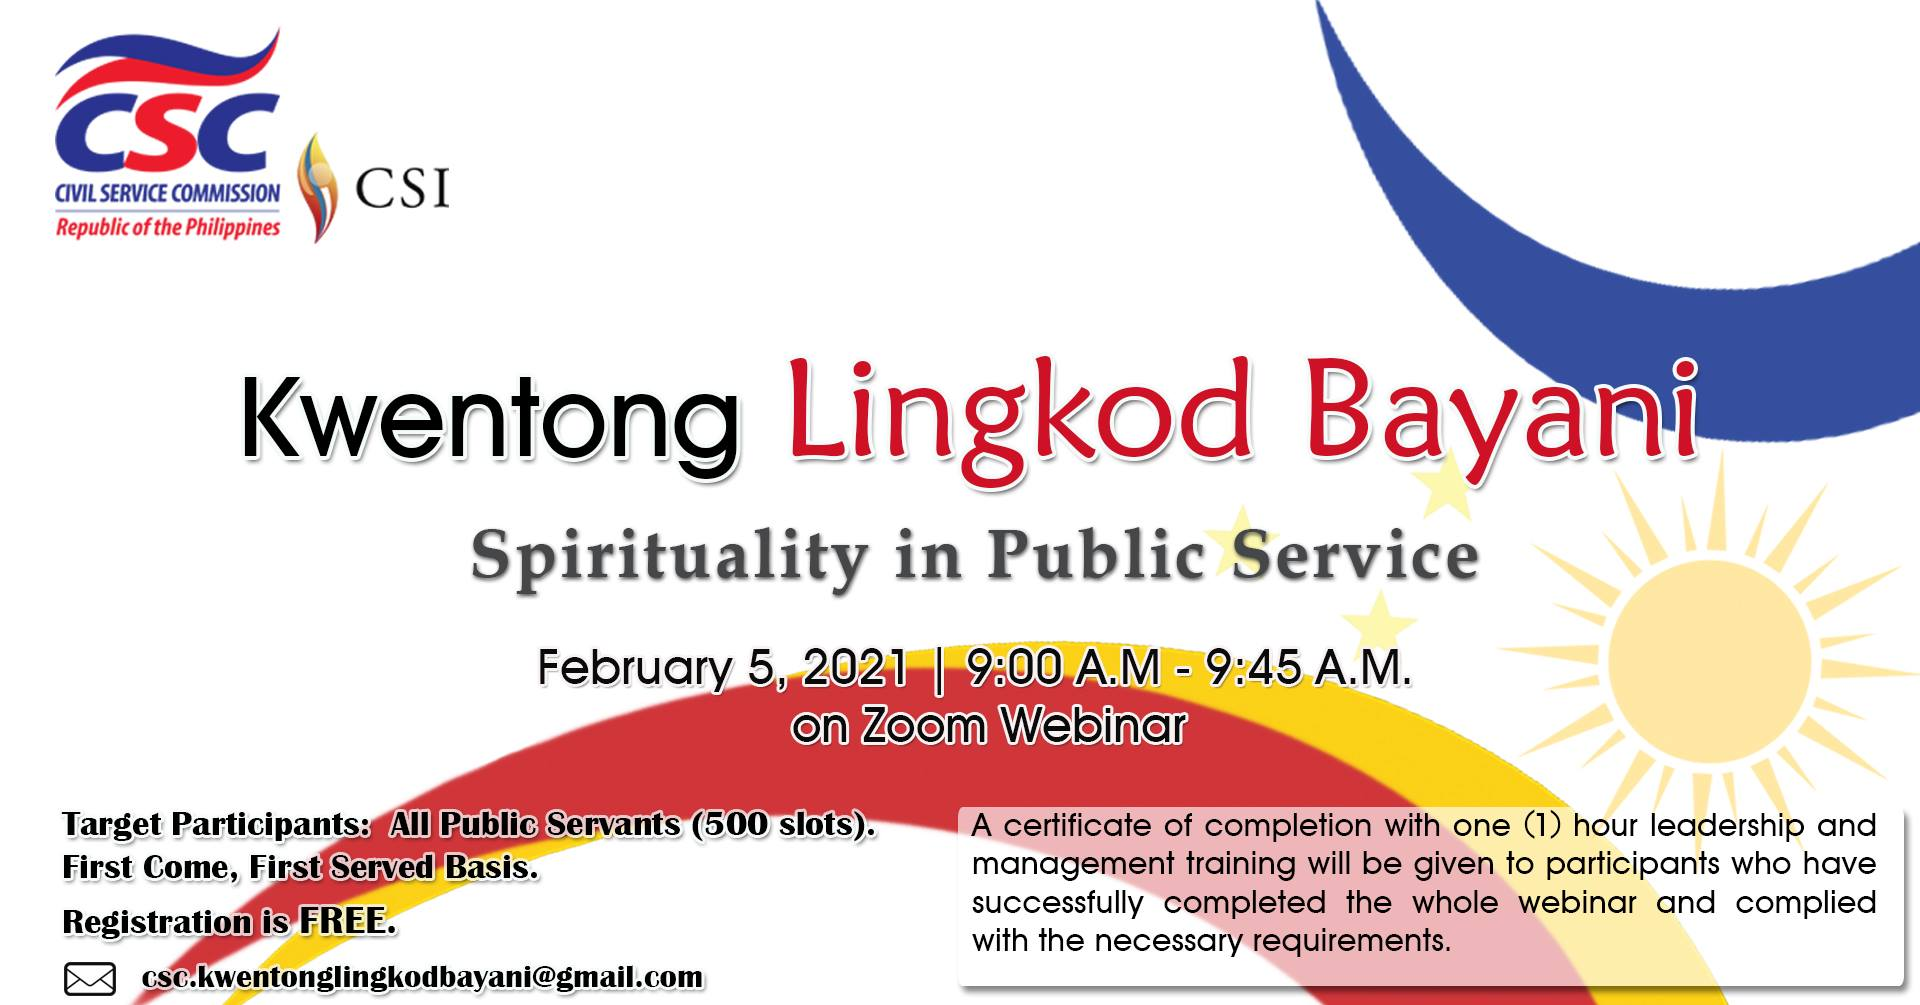 Kwentong Lingkod Bayani